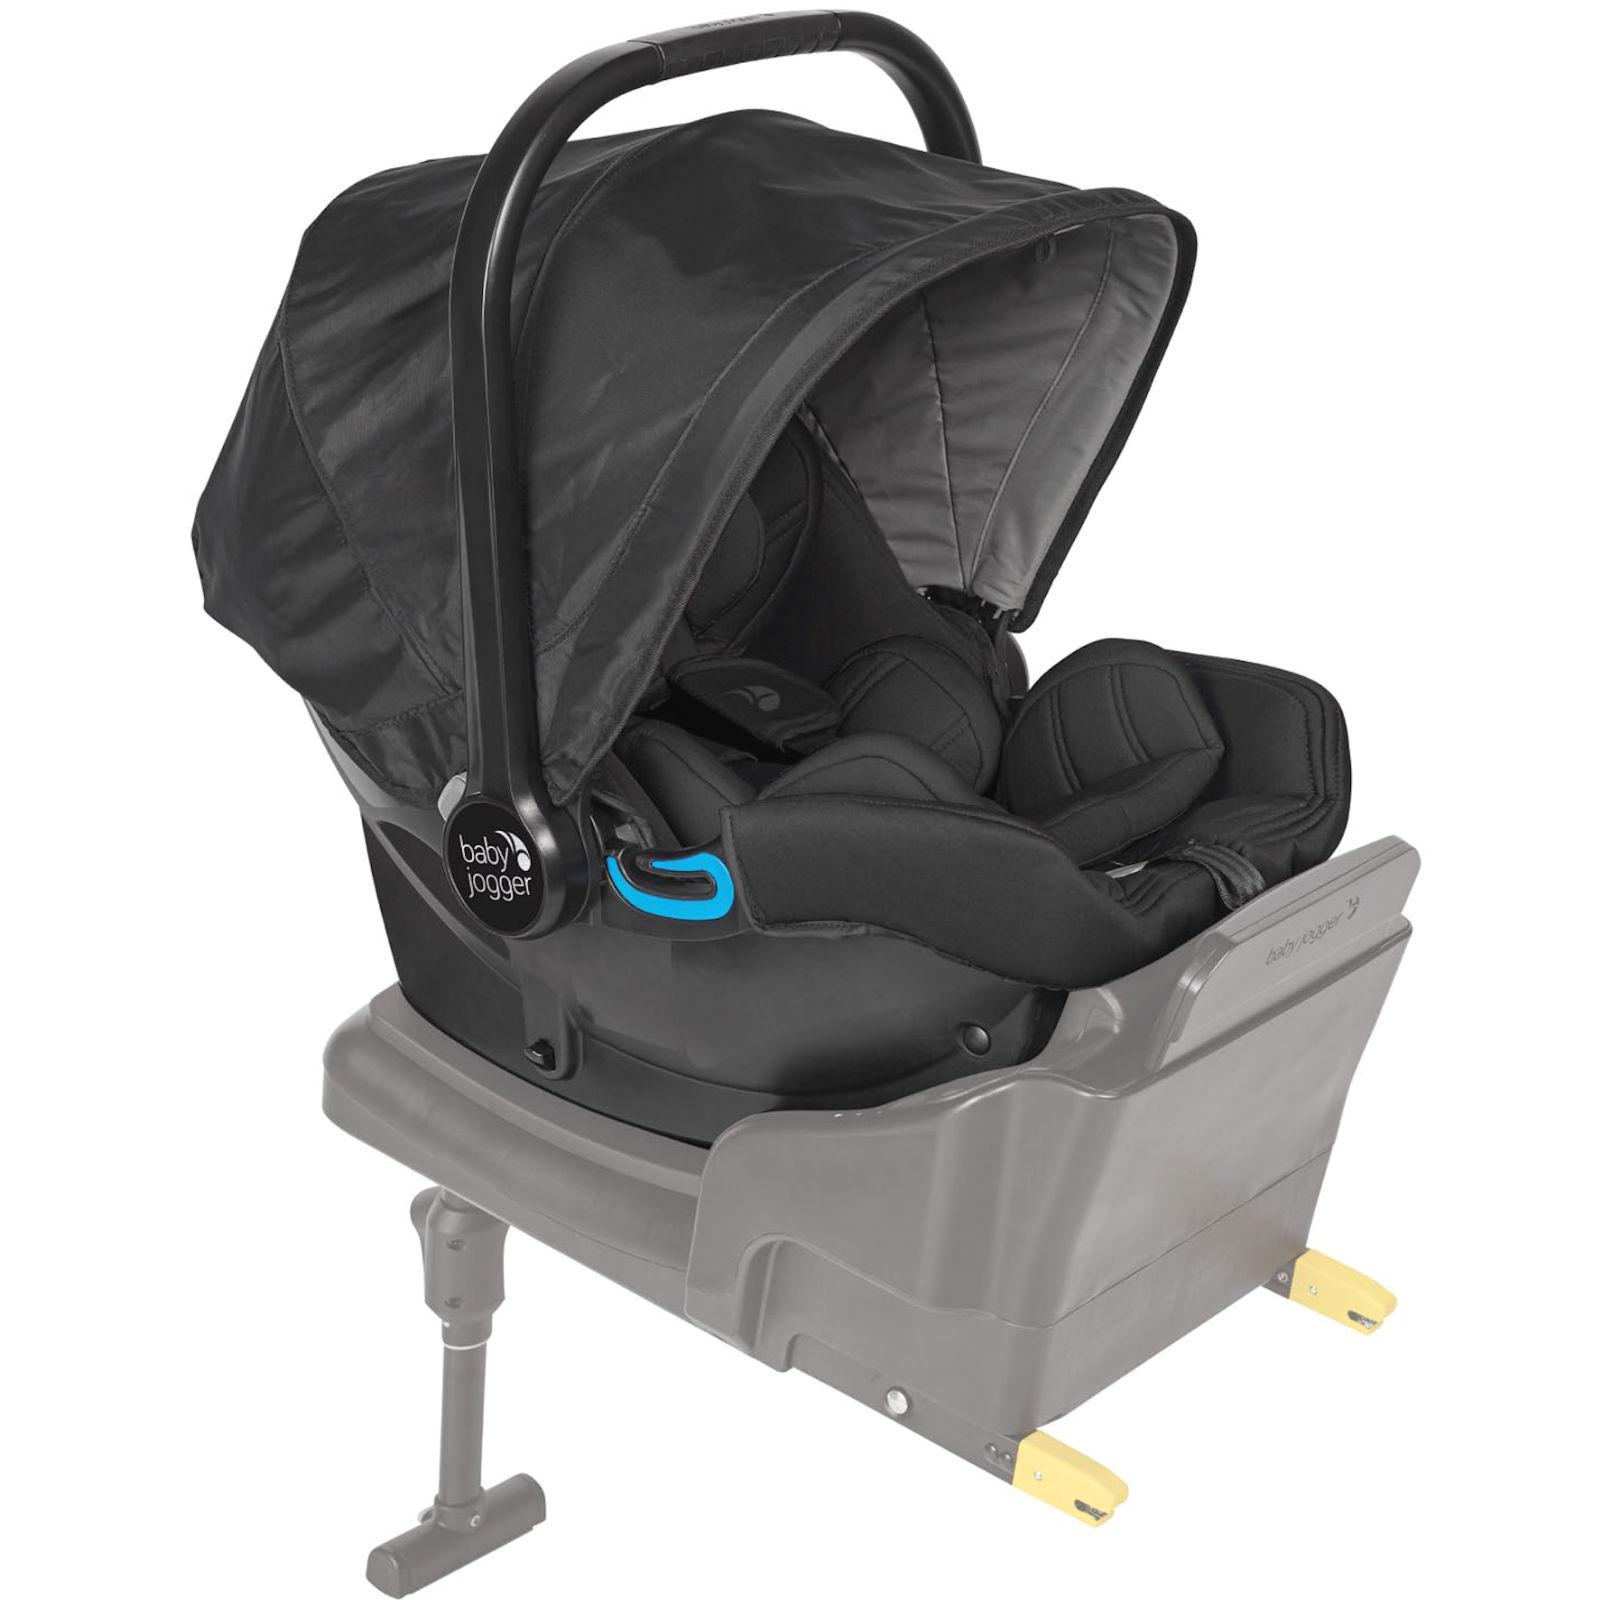 baby jogger city go group 0 i size infant car seat black buy at online4baby. Black Bedroom Furniture Sets. Home Design Ideas